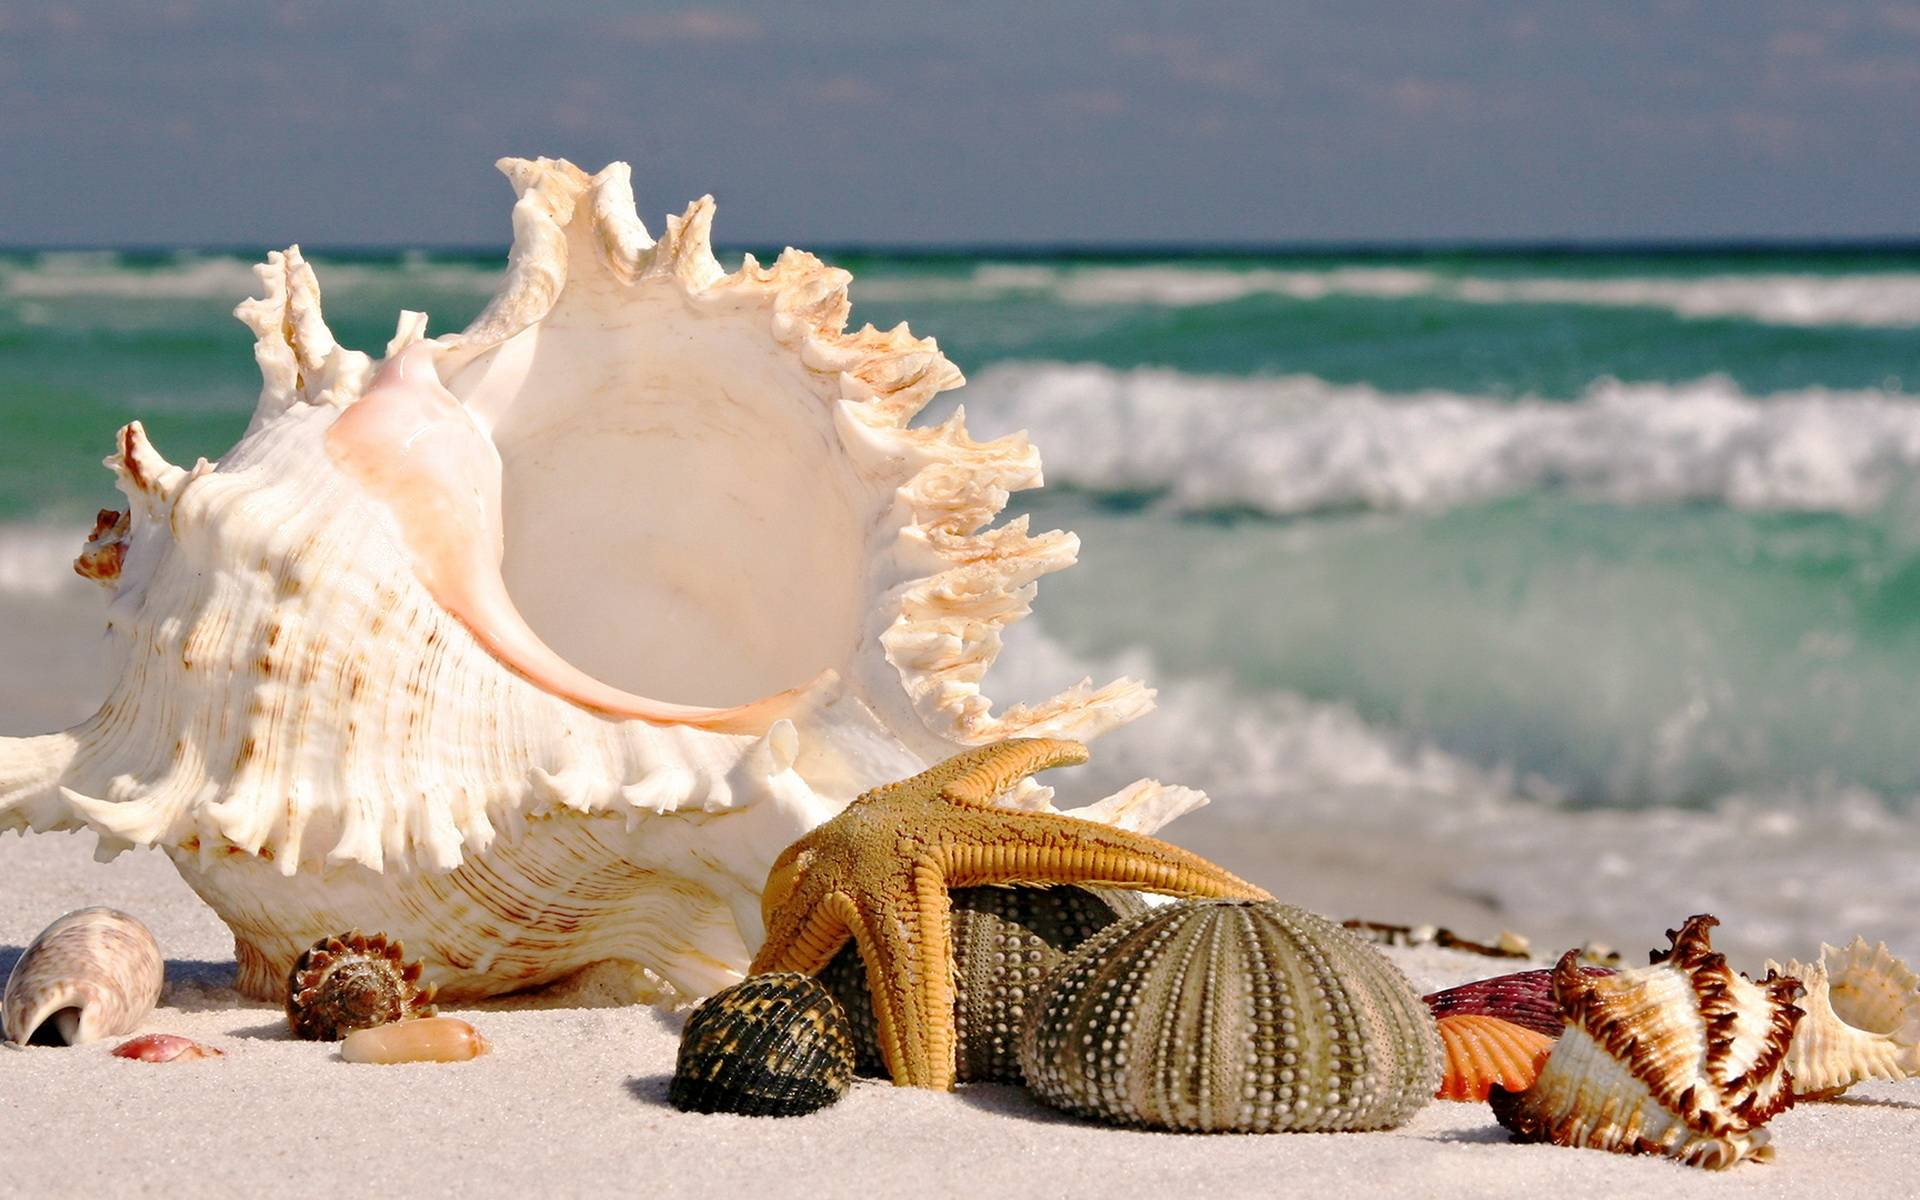 Beautiful Seashell Wallpaper